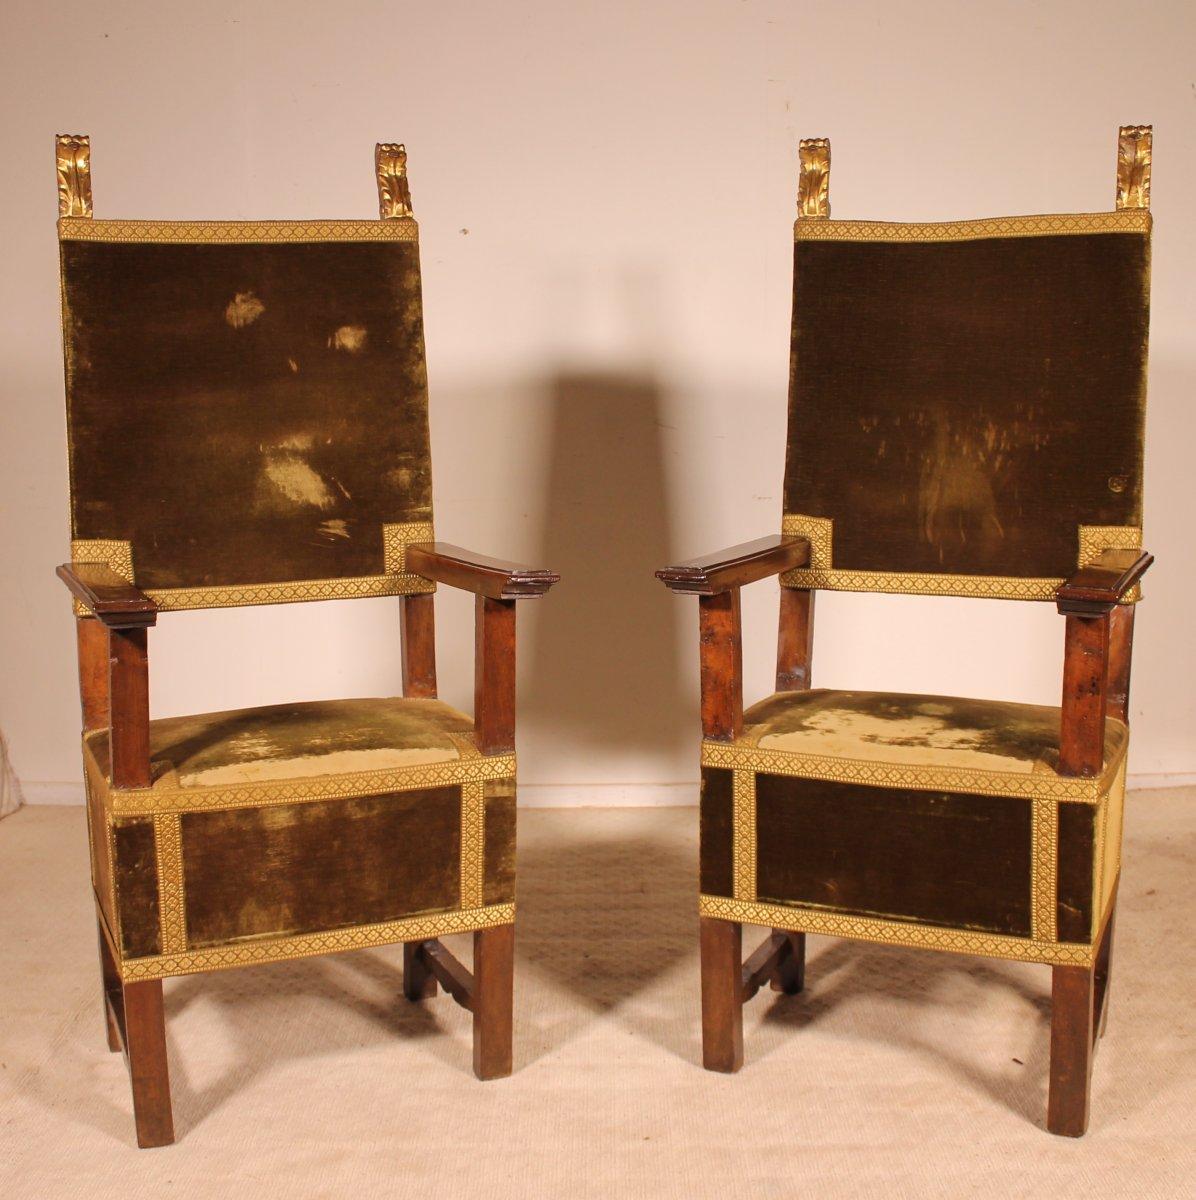 Pair Of Italian Armchairs In Walnut Circa 1600-renaissance Period